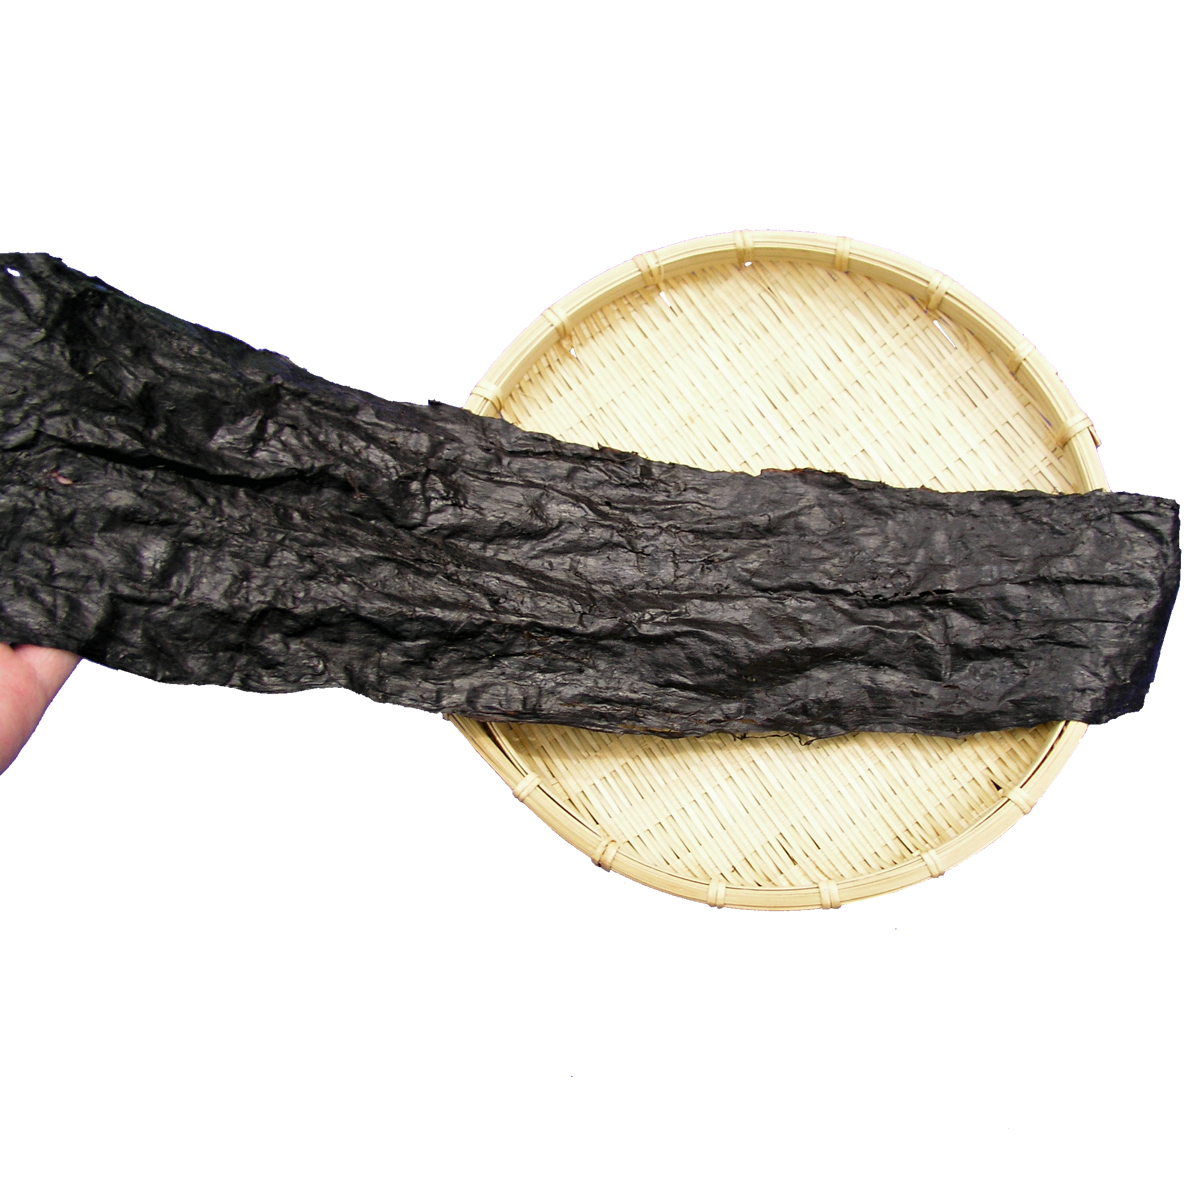 【20g】天然岩のり 十六島海苔(うっぷるいのり)【お歳暮】【お雑煮】【十六島のり】